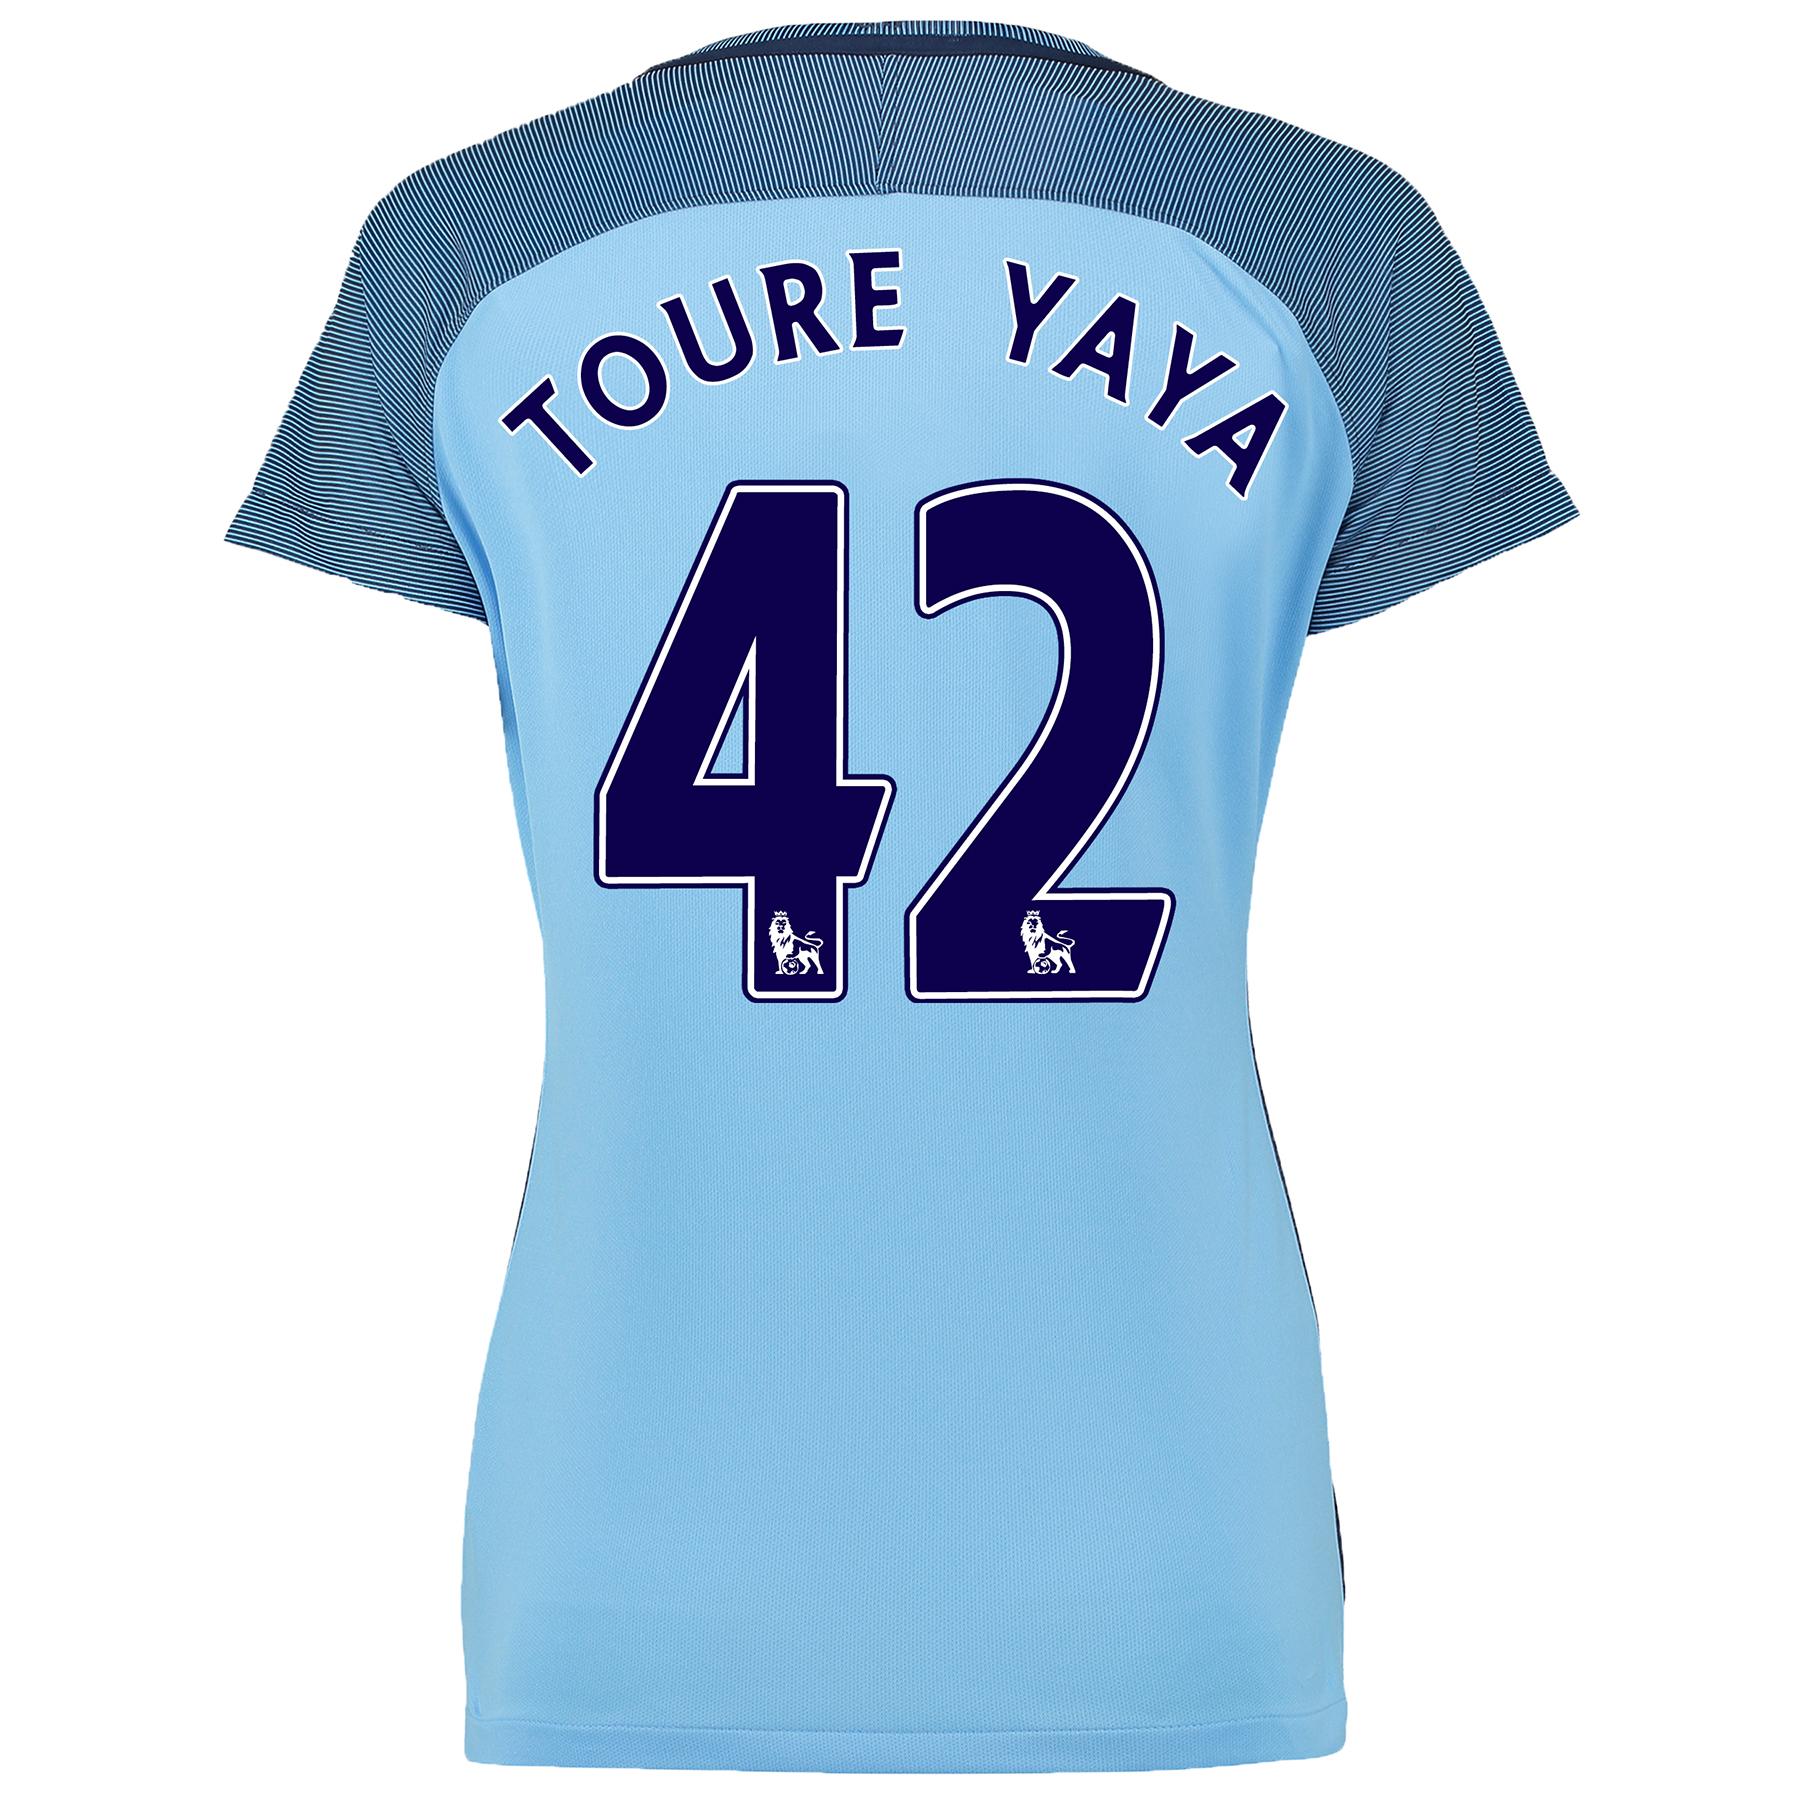 Manchester City Home Shirt 2016-17 - Womens with Toure Yaya 42 printin